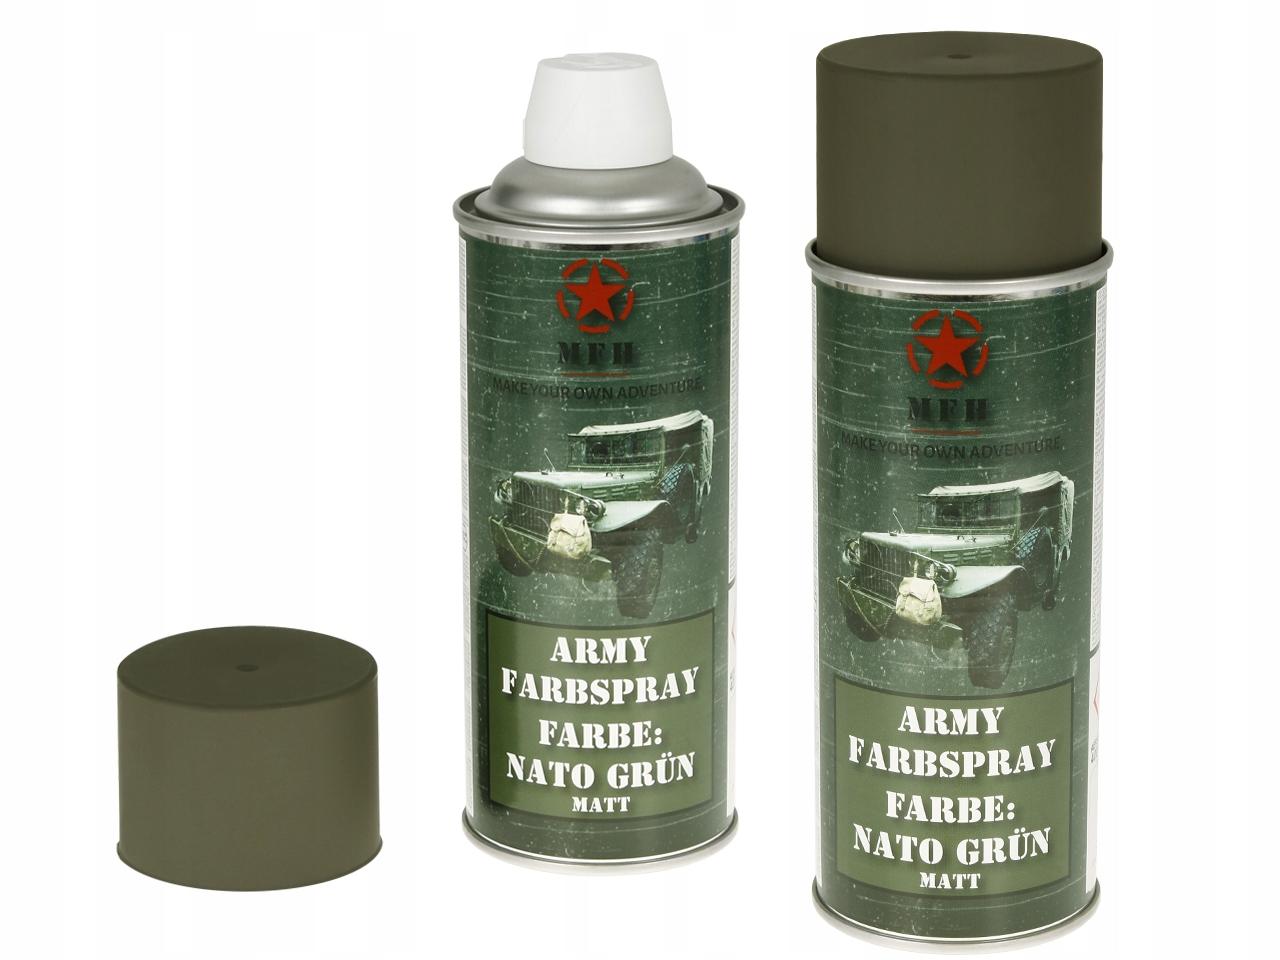 MFH FARBA WOJSKOWA SPRAY 400 мл НАТО Зеленый коврик